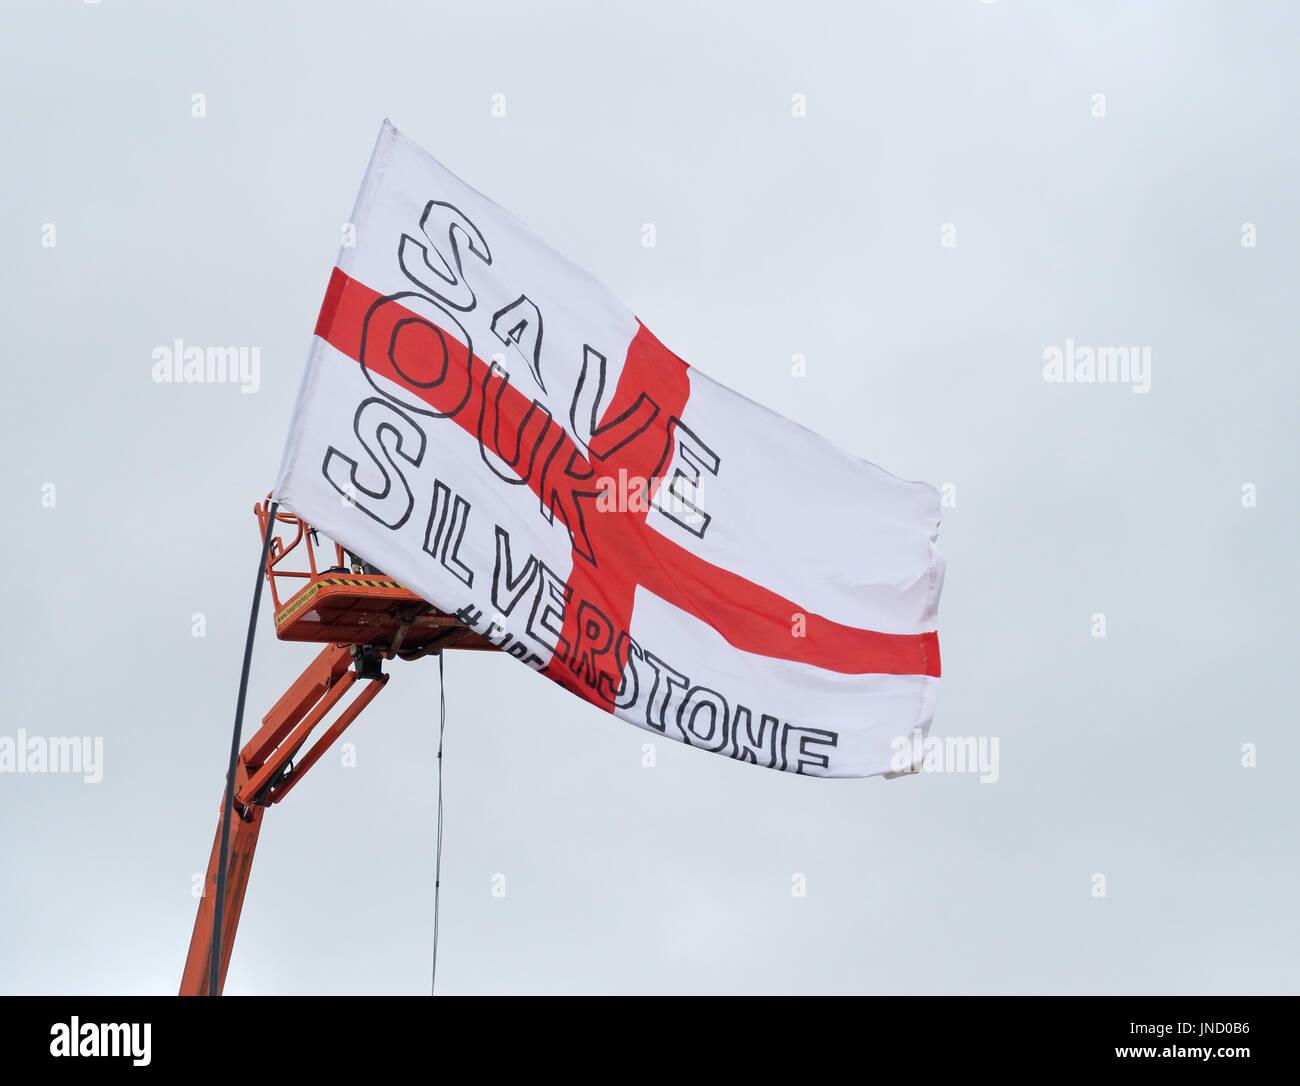 SaveOurSilverstone Flag, F1 Circuit July 2017 - Stock Image